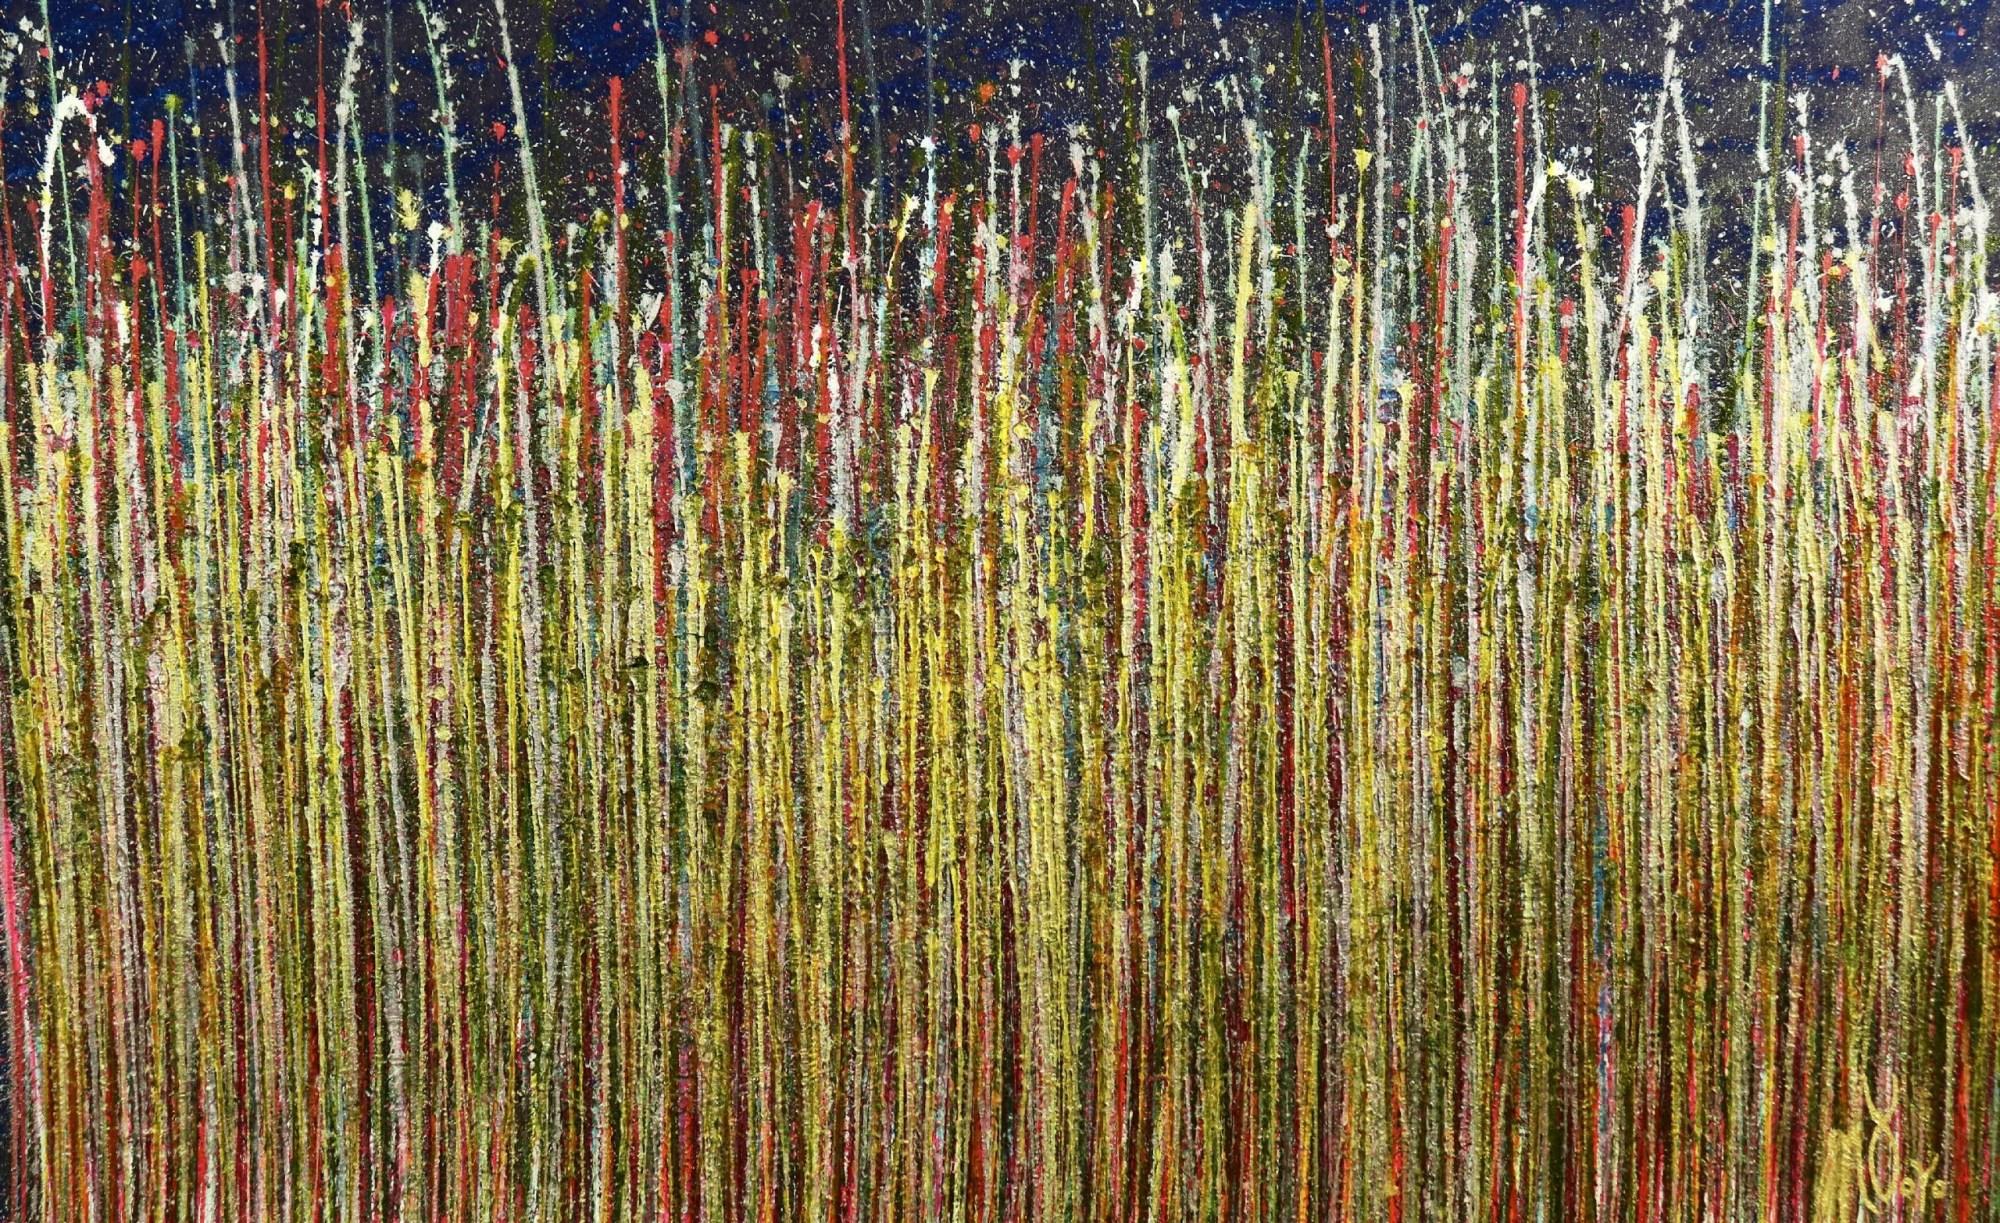 SOLD - Full Camvas - A closer look (Luminance garden) 2 Painting by Nestor Toro